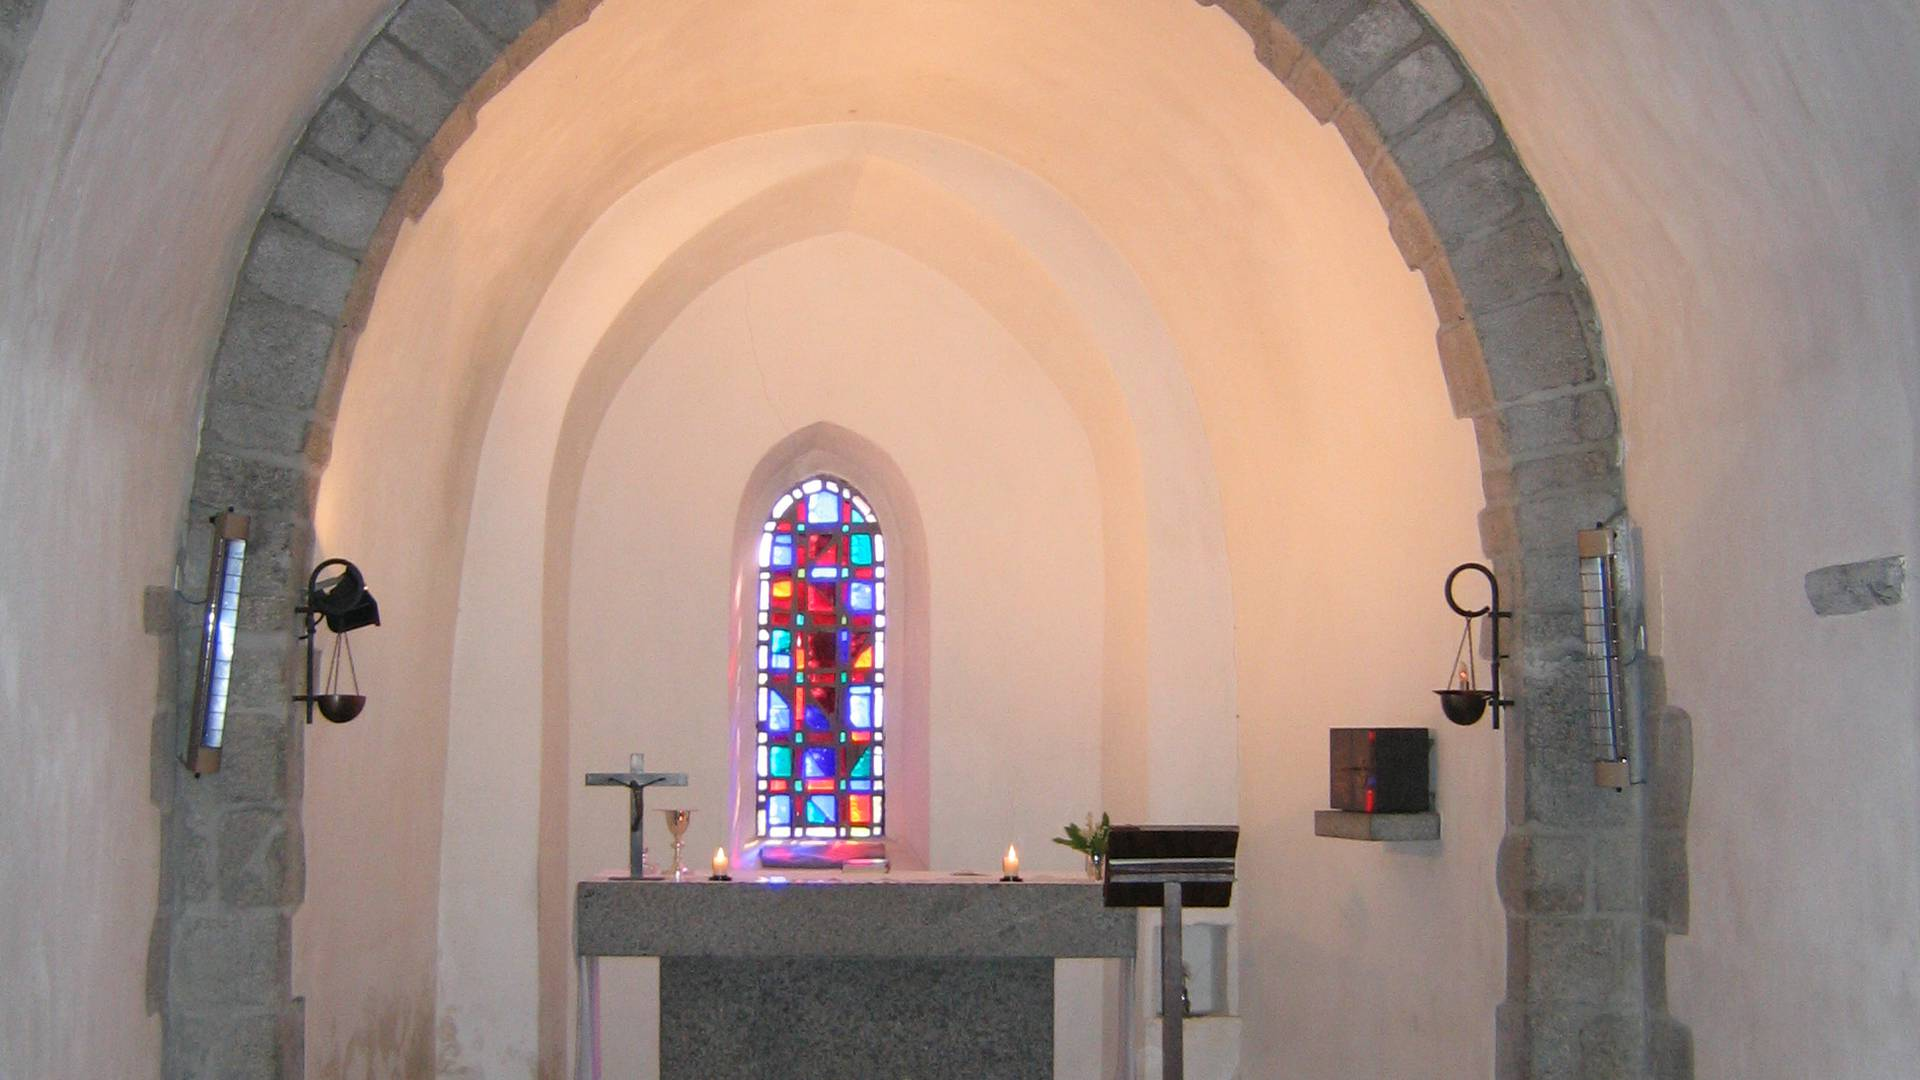 Chapel of Notre dame de la Paix